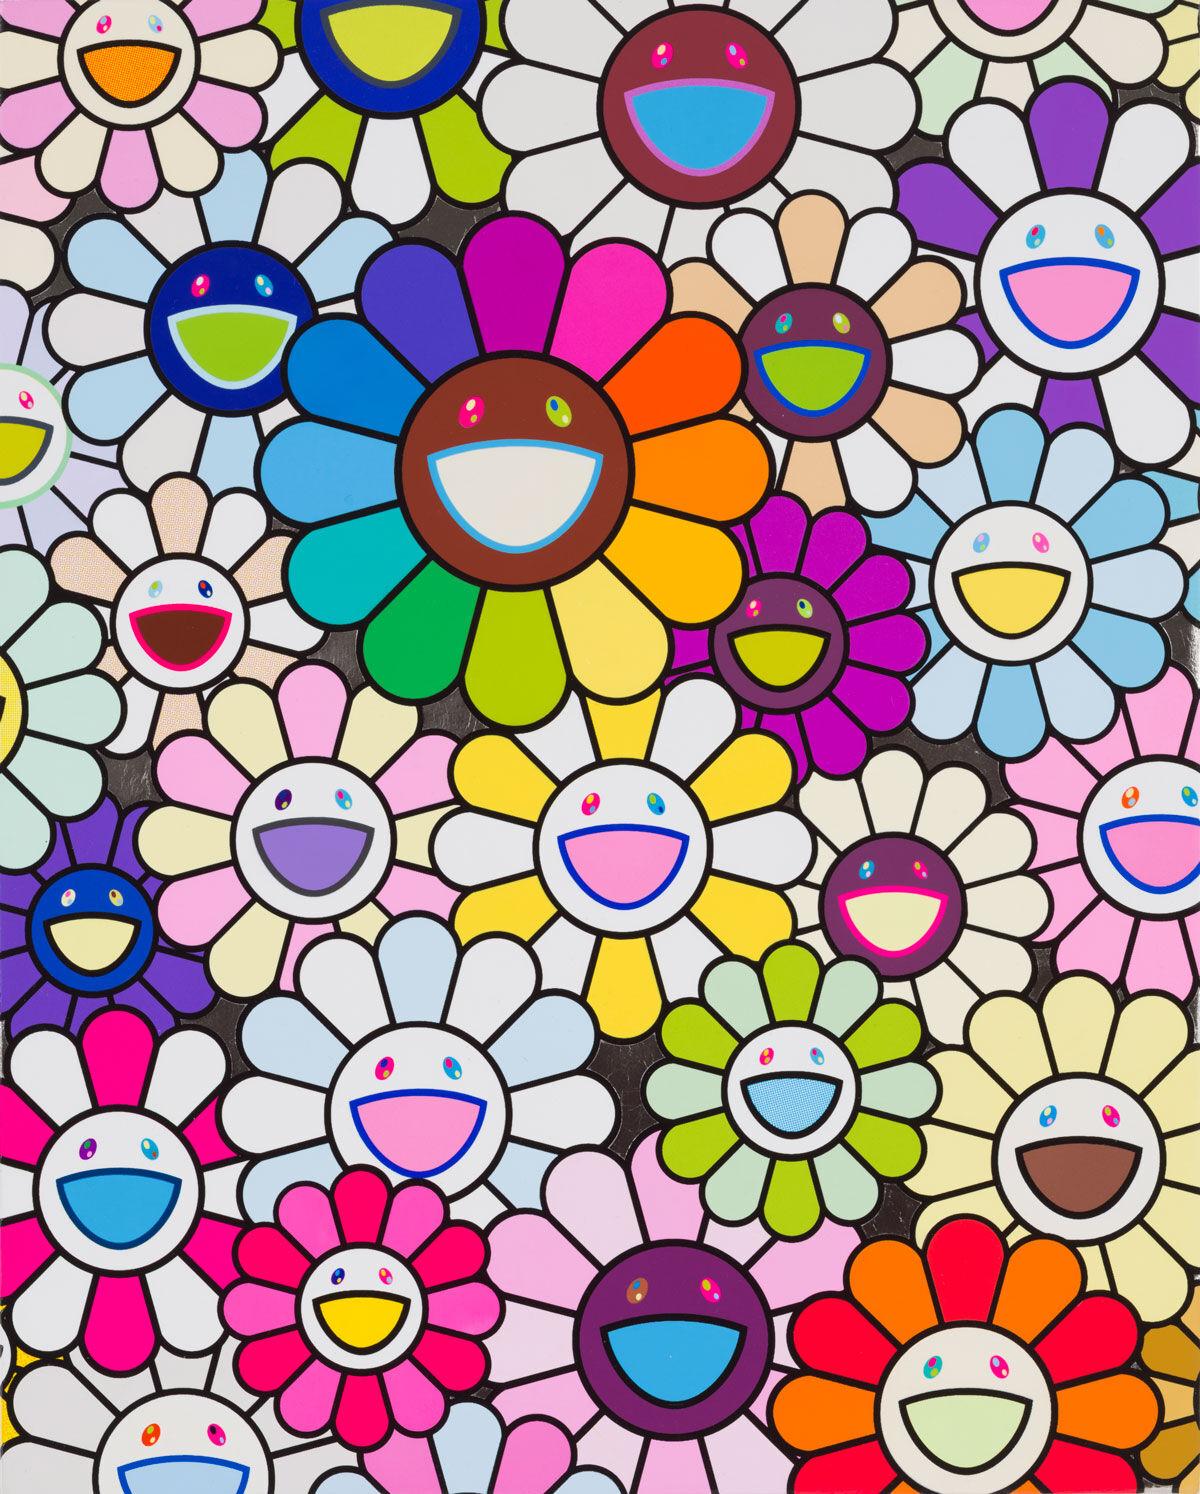 Takashi Murakami, Field of Flowers, 2019. ©︎  Takashi Murakami/Kaikai Kiki Co., Ltd. All Rights Reserved. Courtesy of Gagosian.